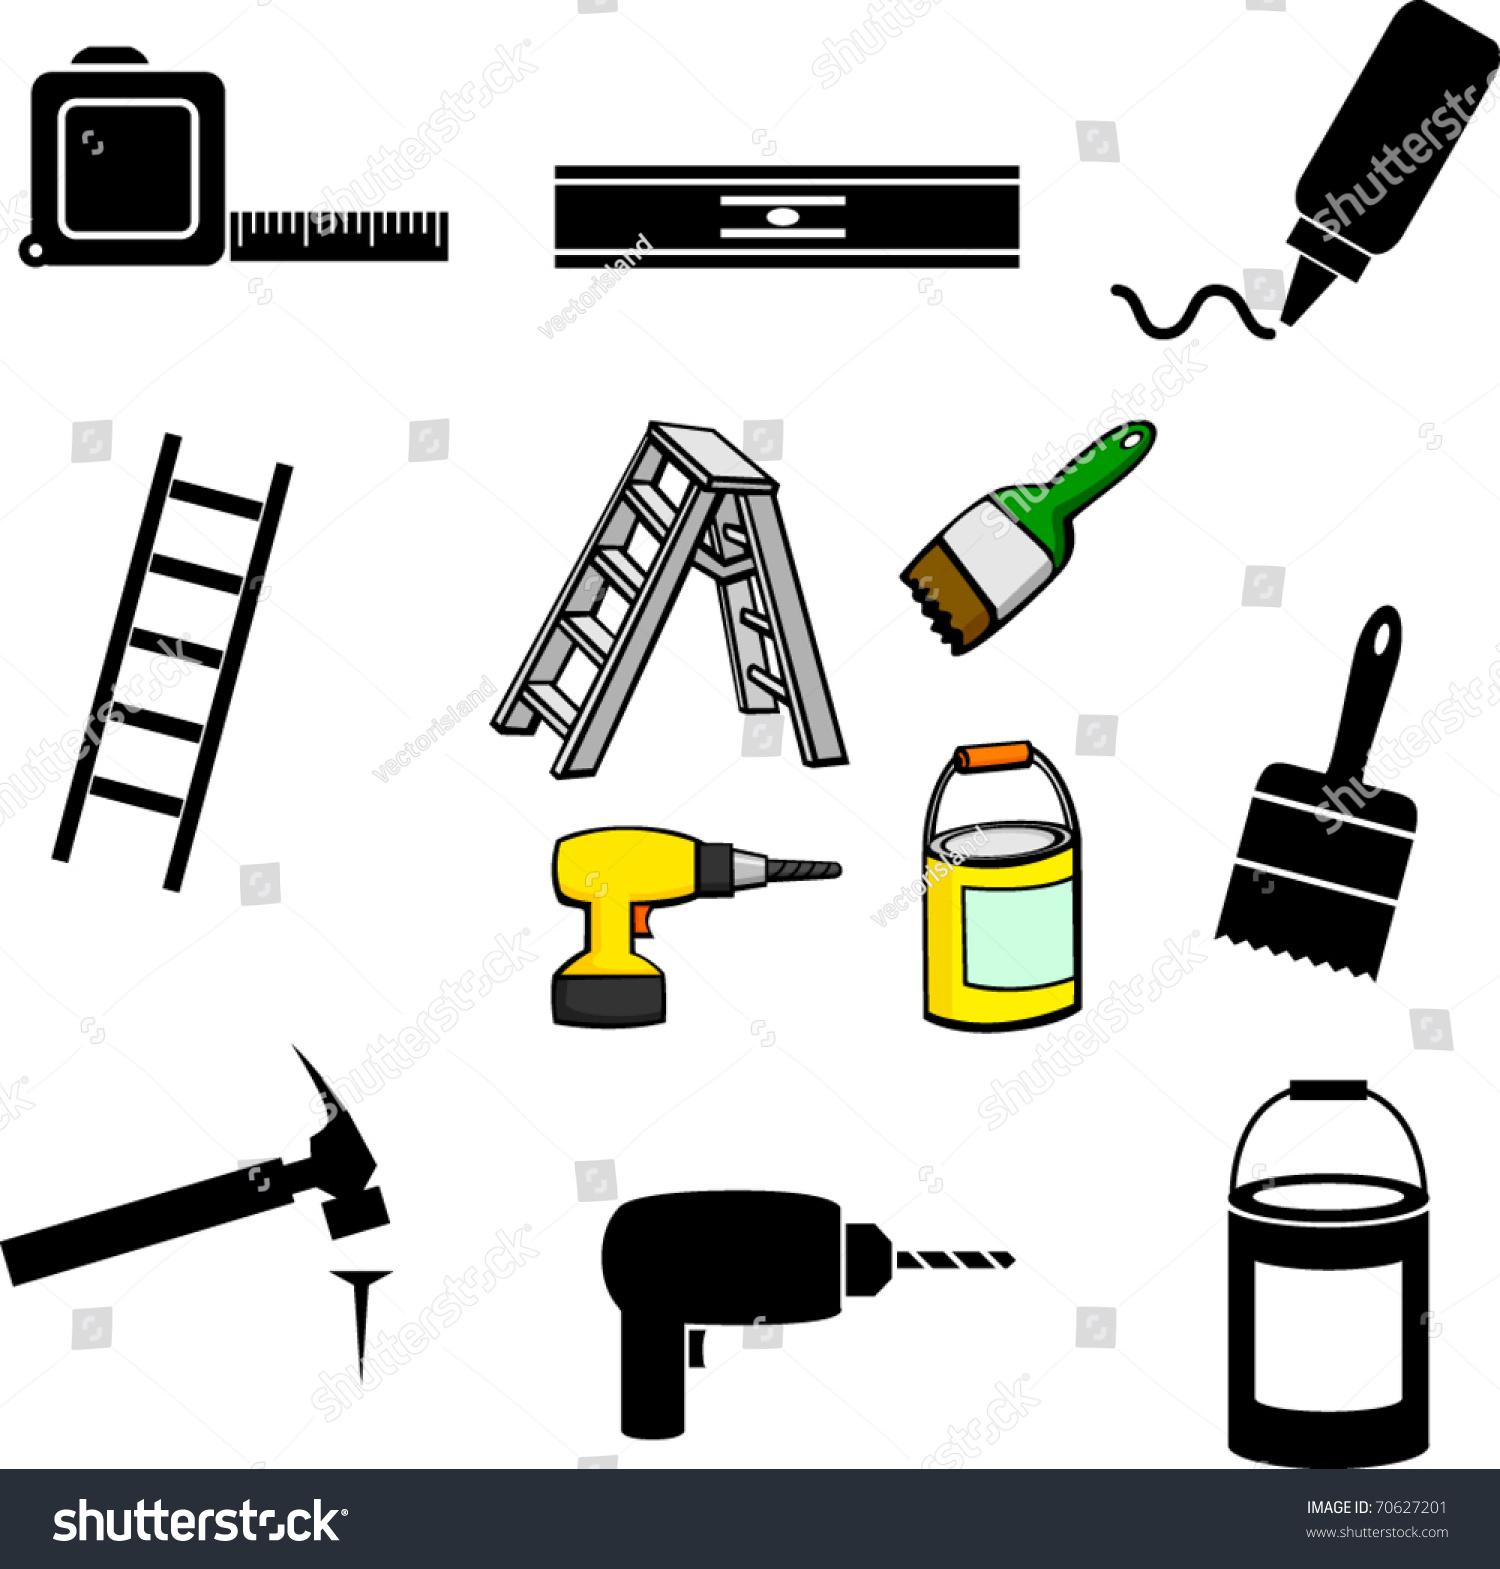 Home Improvement Illustrations And Symbols Set - 70627201 ...